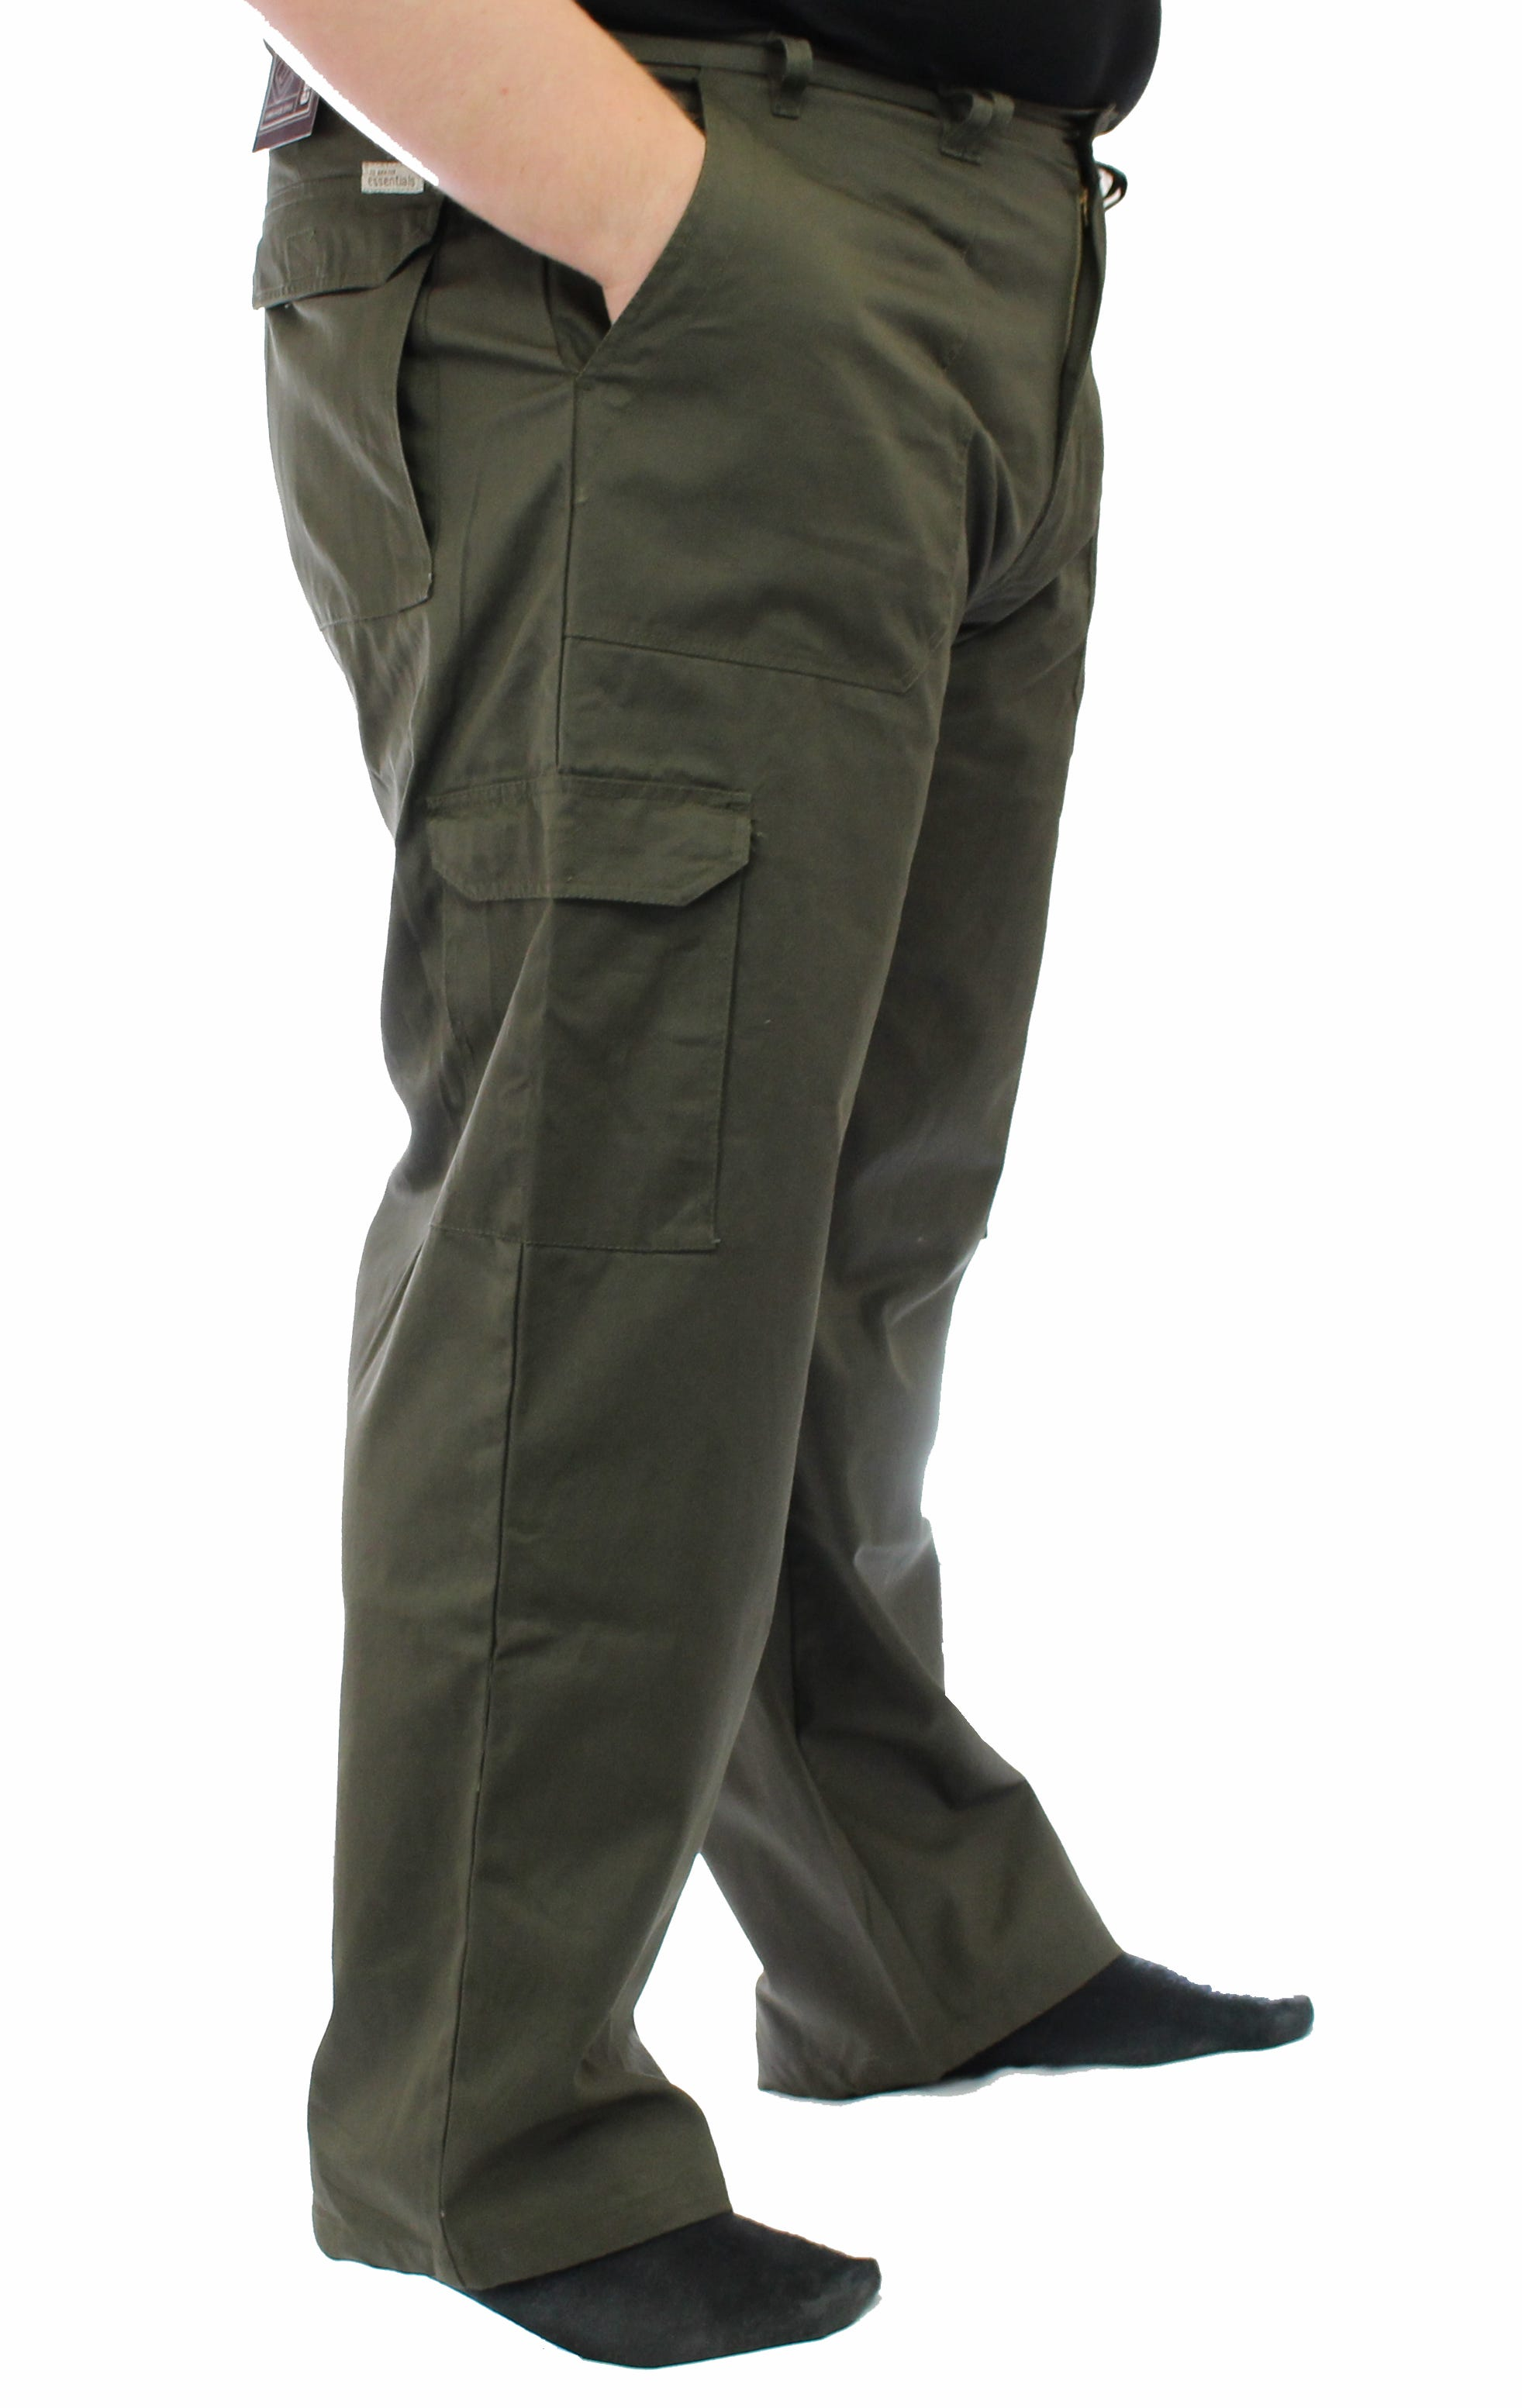 "Ed Baxter Victory - Heavy Duty Cargo Combat Trousers - Khaki - 50"" Waist, 30"" Leg"